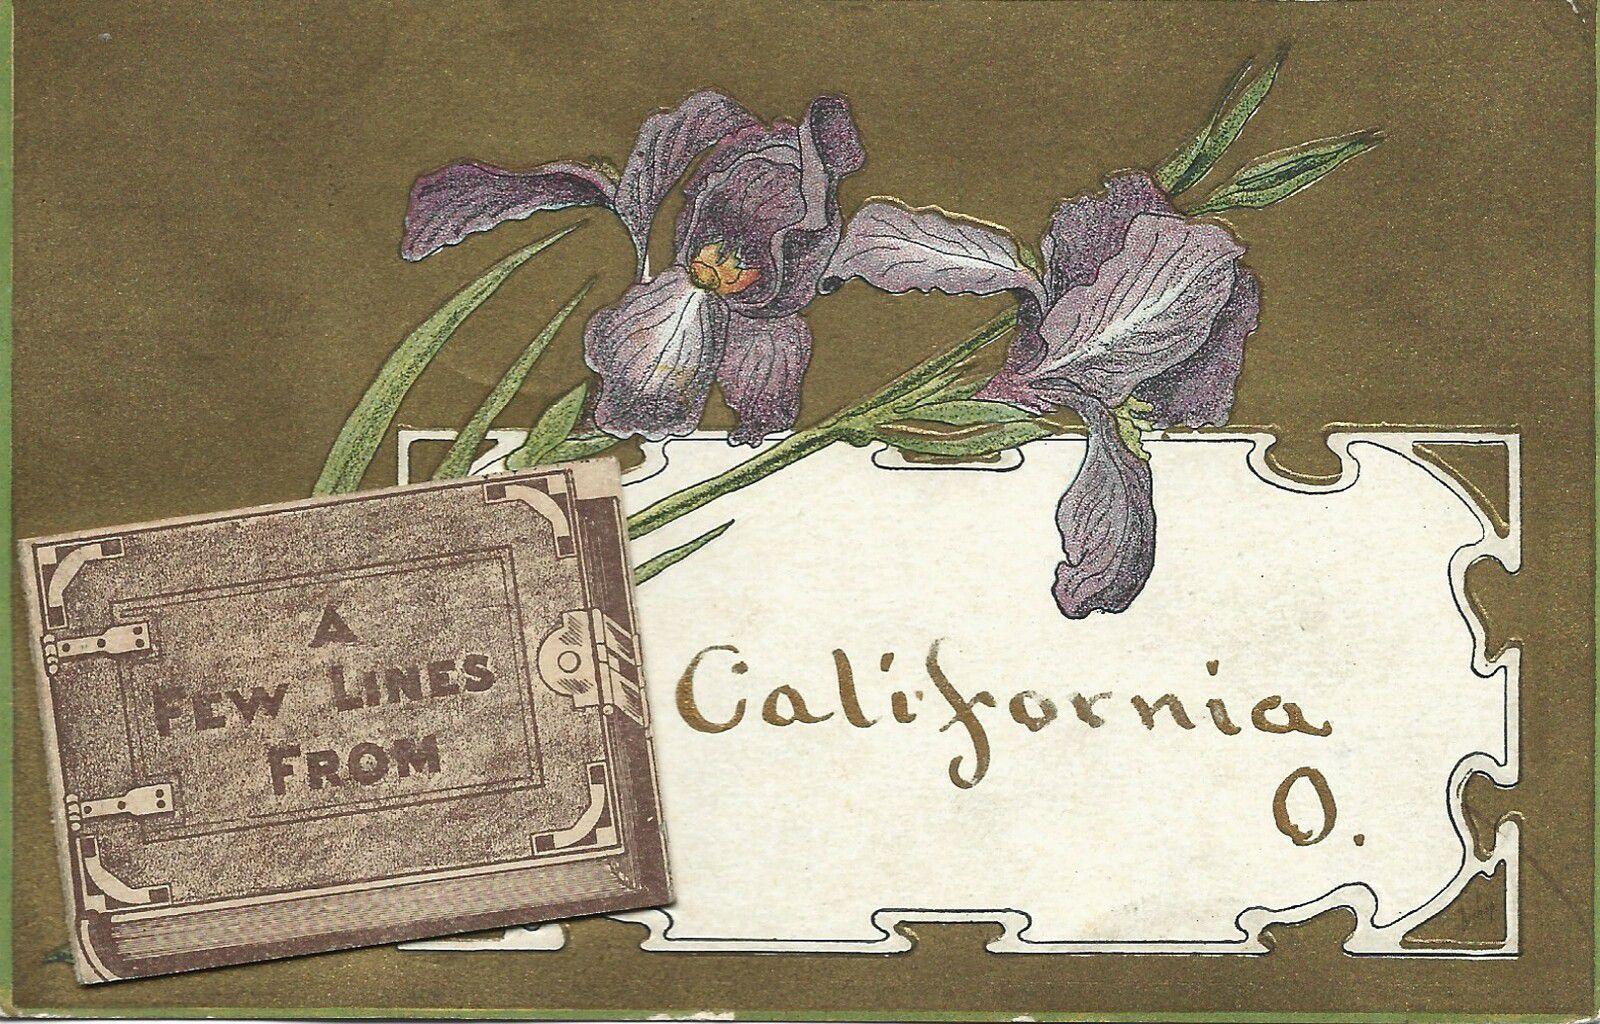 IRIS 2041  - 1908 - A FEW LINES FROM CALIFORNIA O.